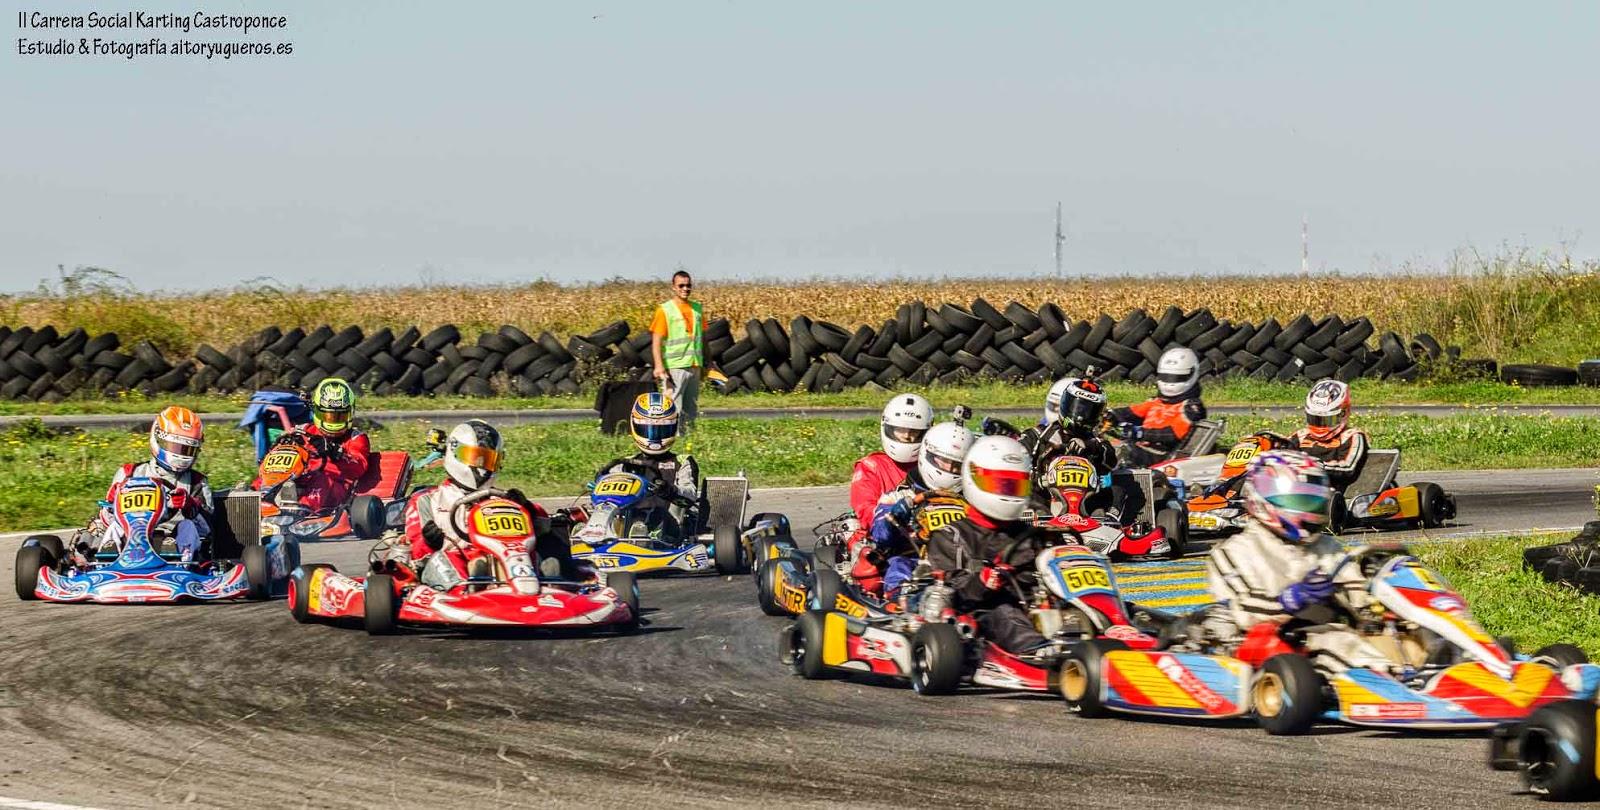 Circuito Karting : Cronica 2 carrera social circuito karting castroponce